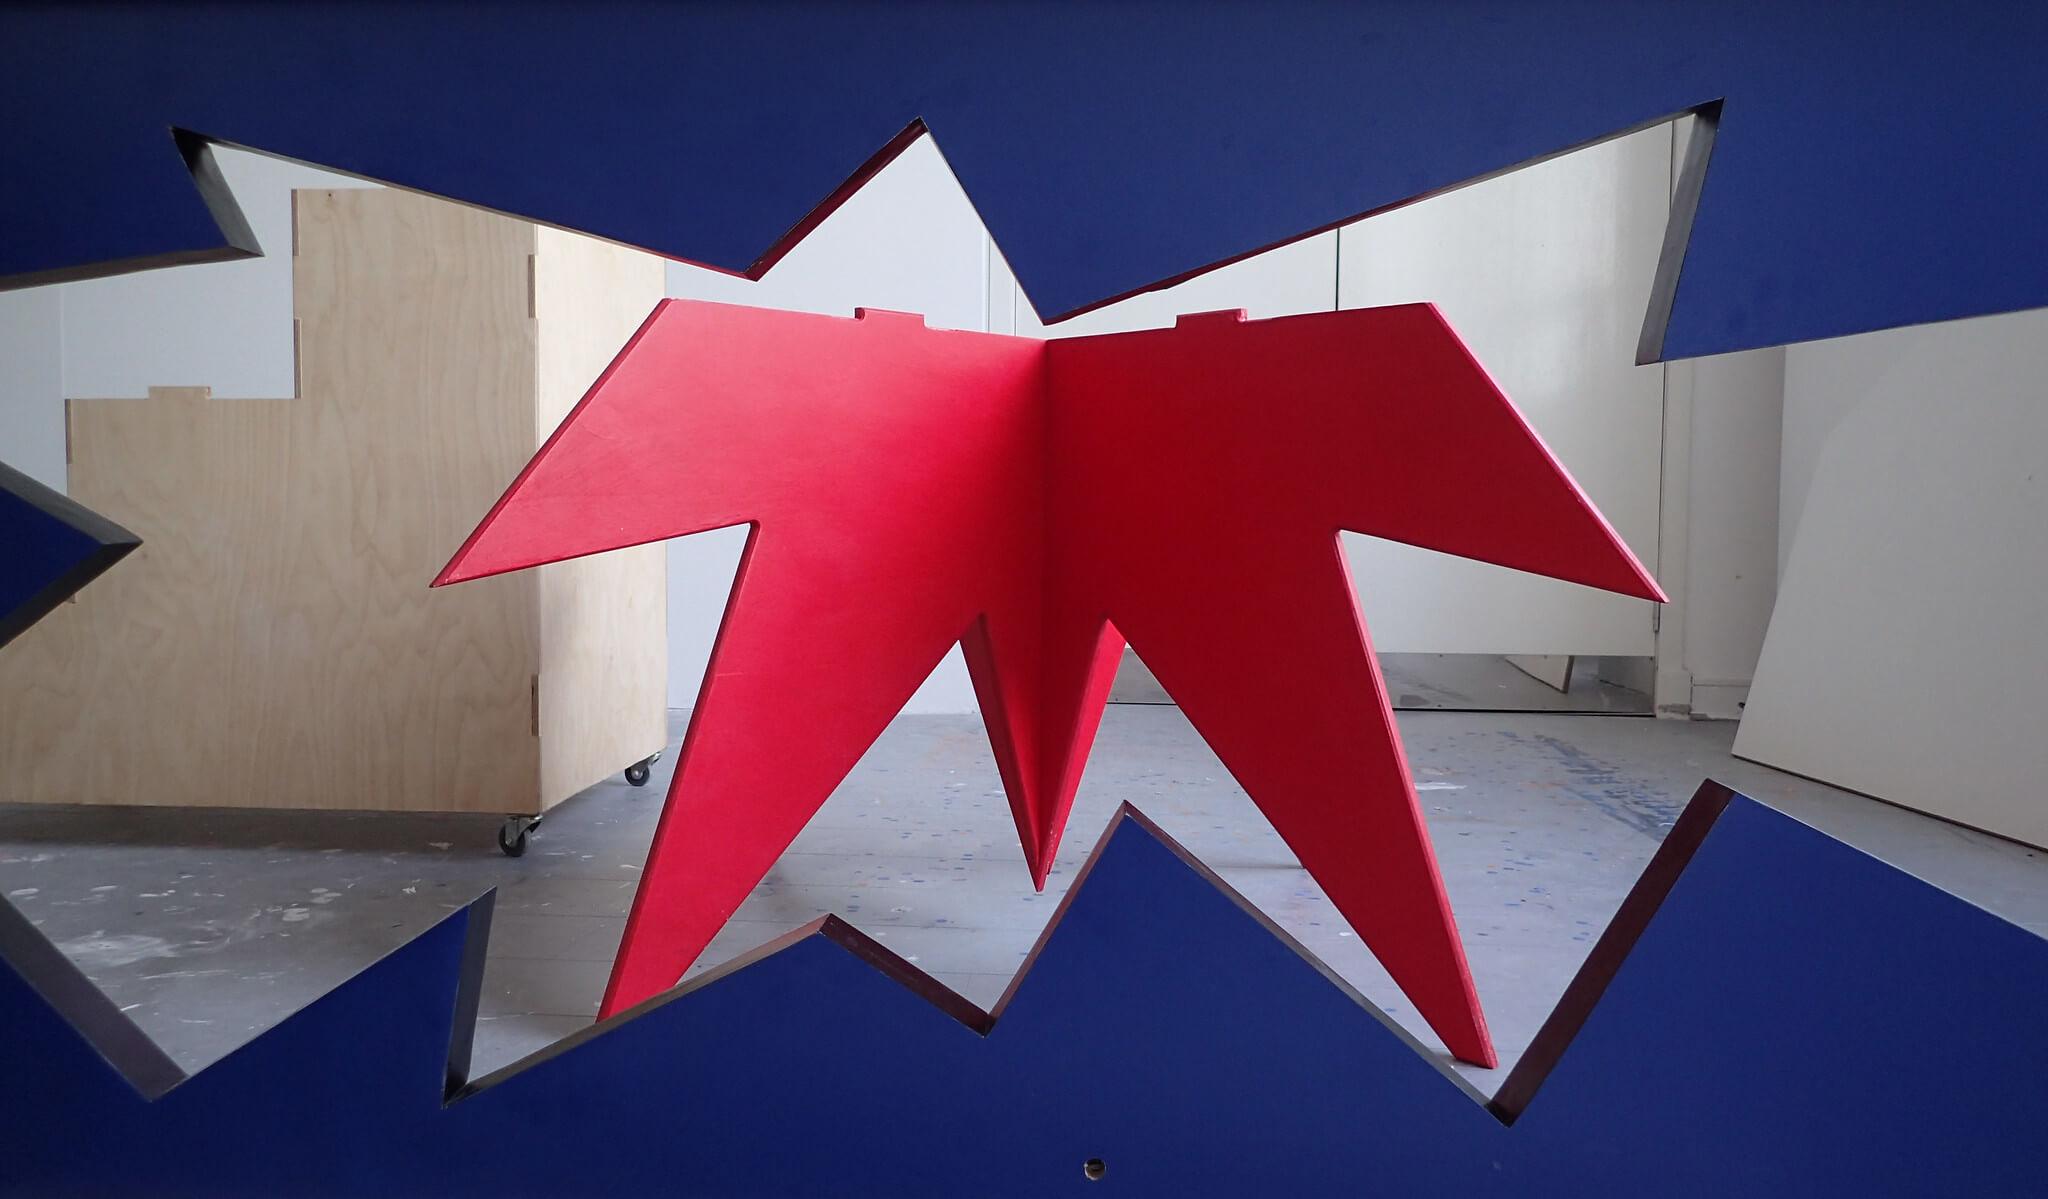 melamine, plywood, art